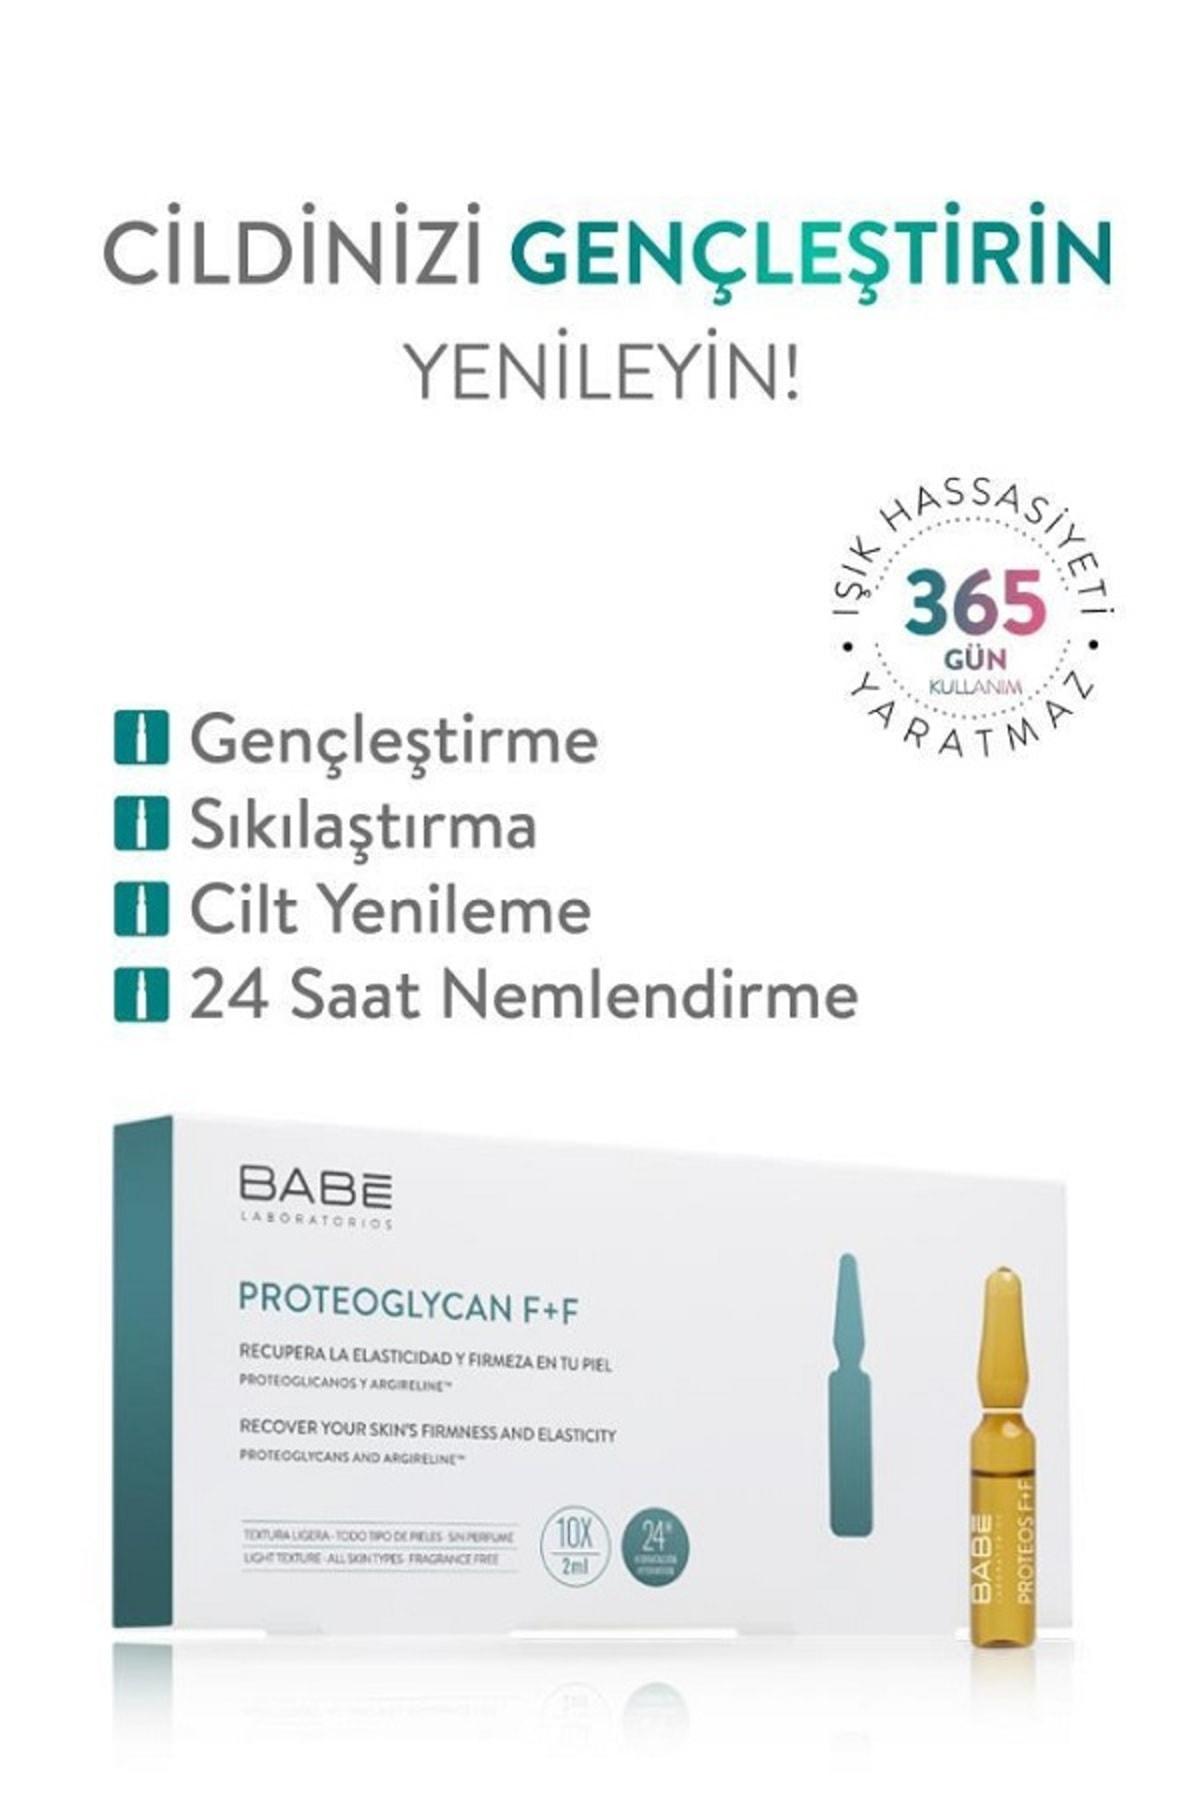 Babe Proteoglycan F+f Ampul Anti Aging Etkili Konsantre Bakım 10x2 ml 2